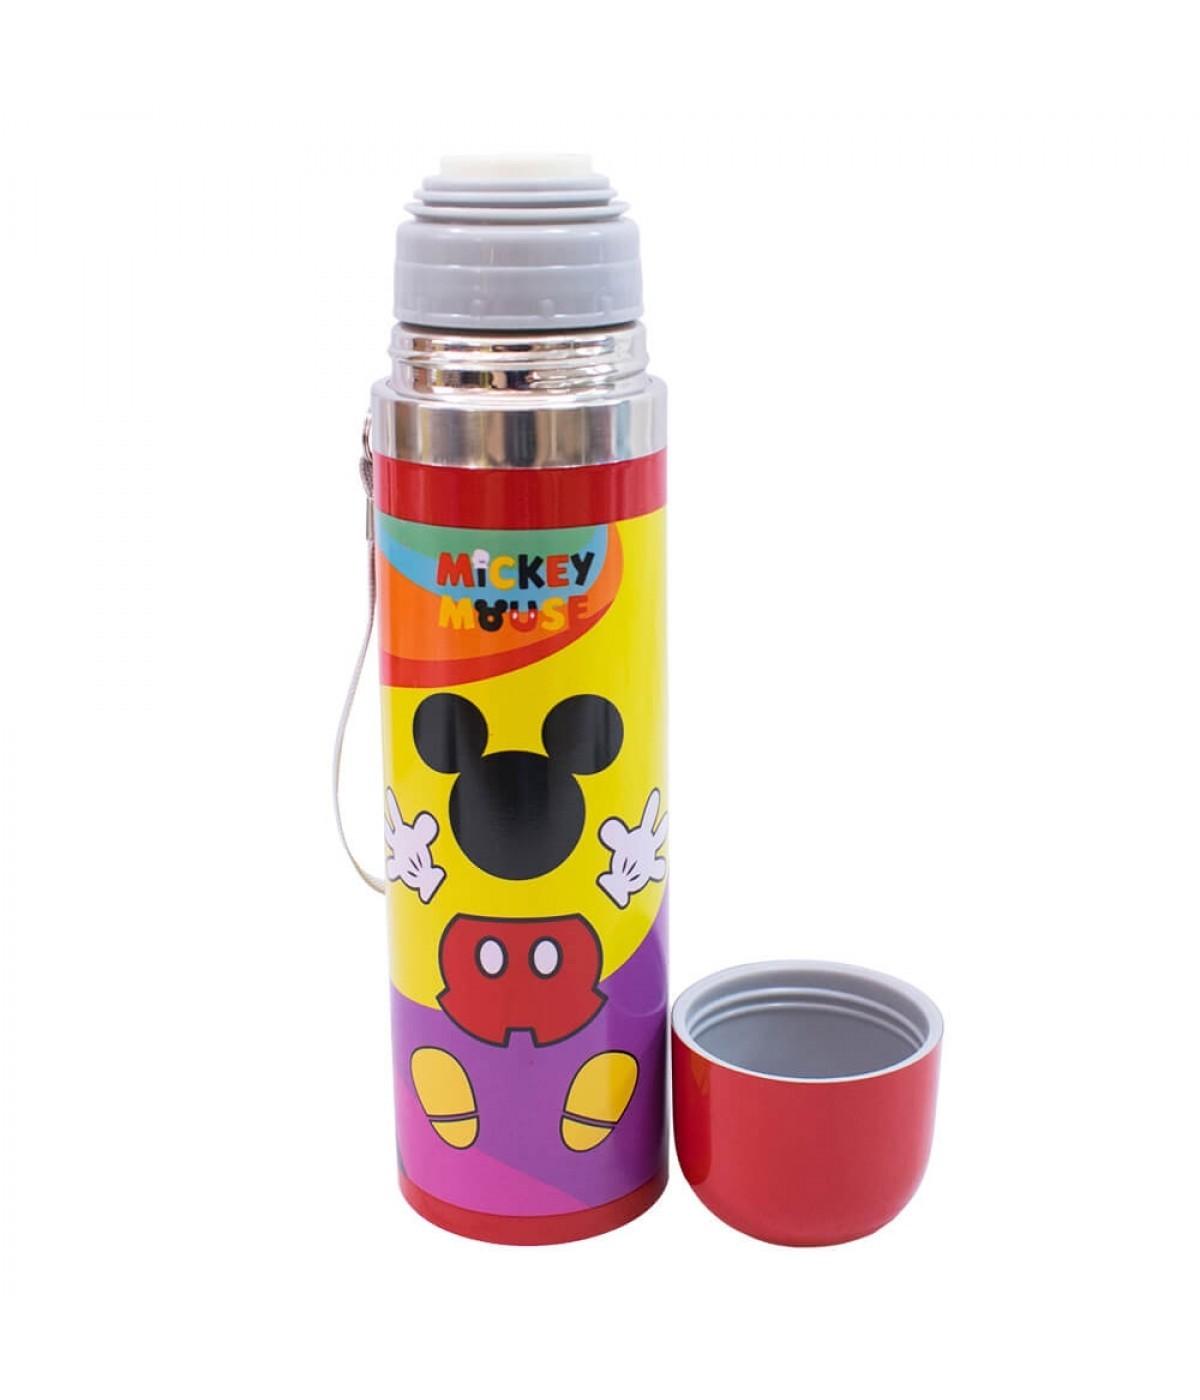 Garrafa Térmica Aço Inox Mickey Mouse 90 anos colorida  (500ml) - Disney